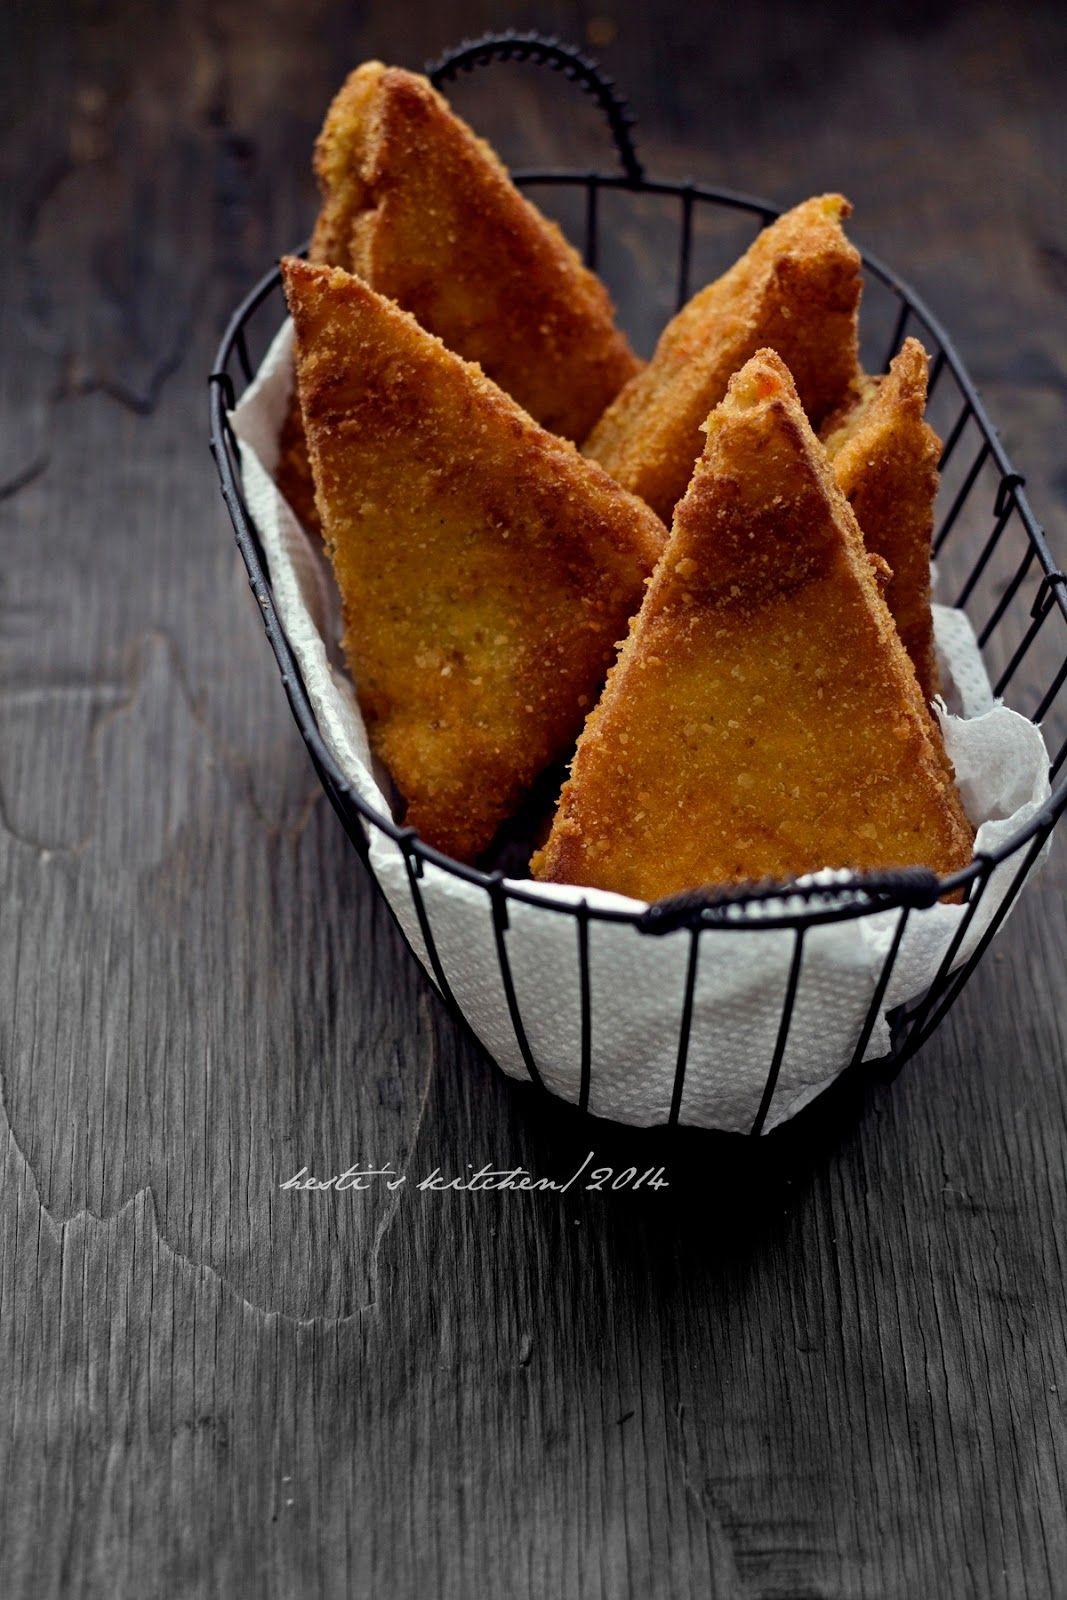 Hesti S Kitchen Yummy For Your Tummy Sandwich Goreng Isi Ragout Ayam Makanan Resep Masakan Resep